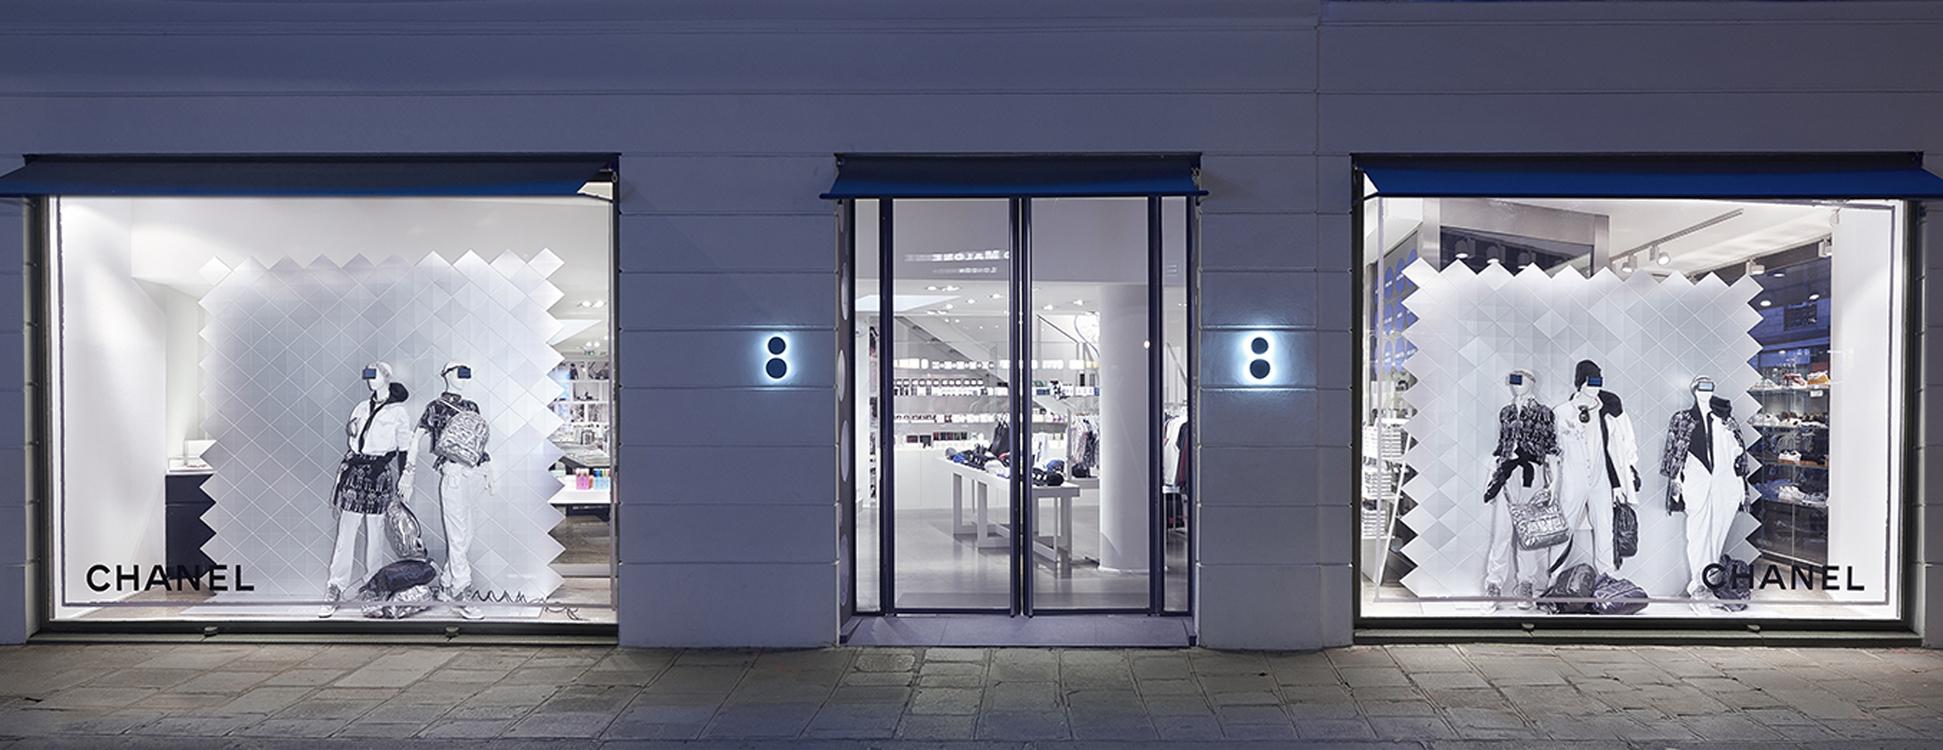 Chanel Mengambil Alih Butik Colette Paris Bersama Pharrell Williams dan Adidas